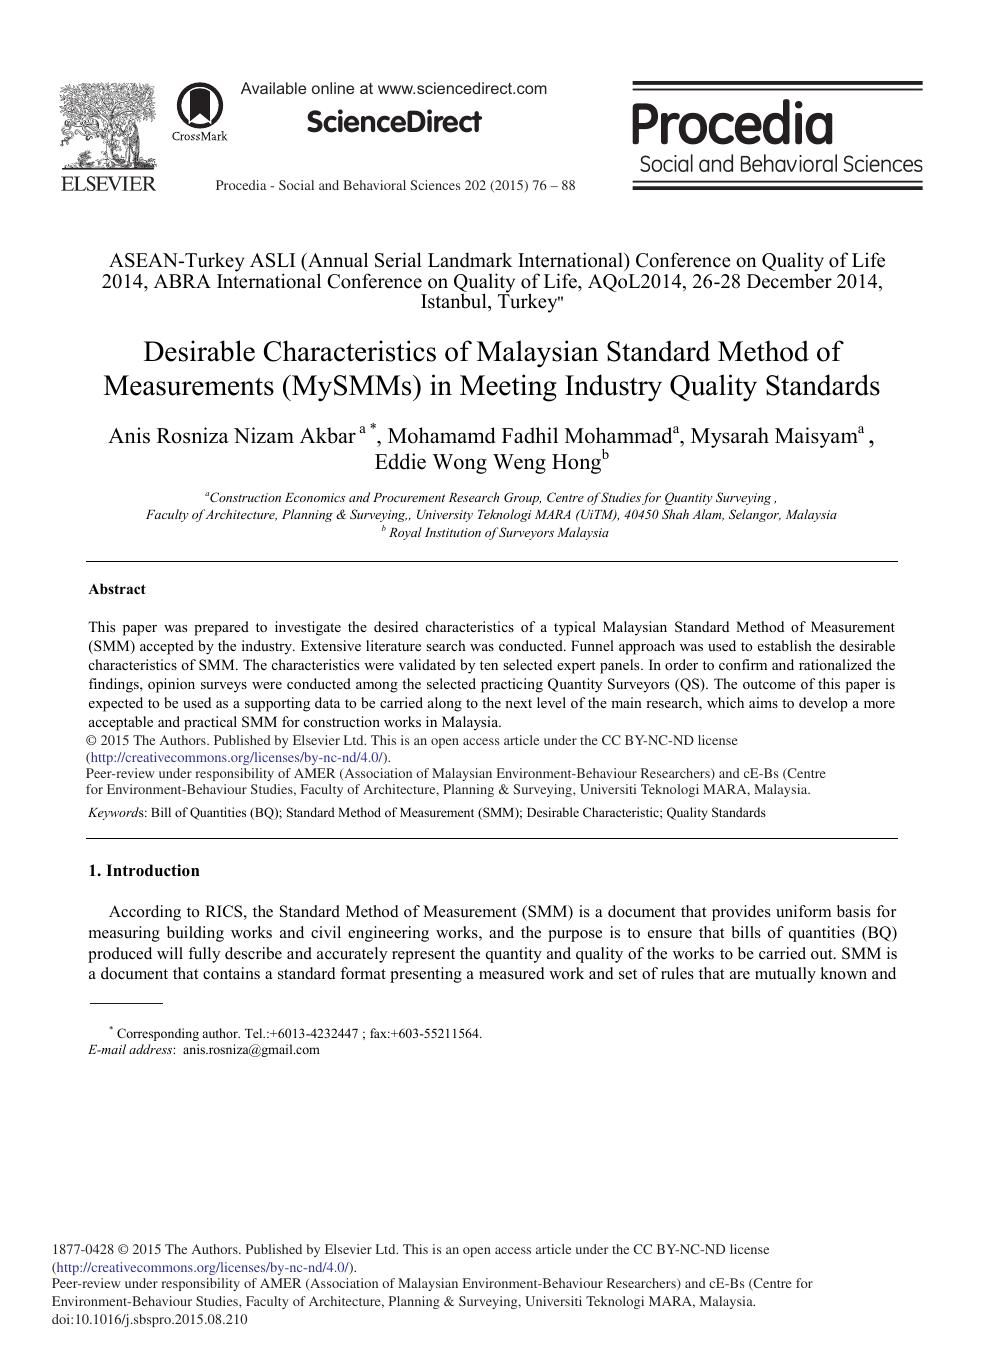 Desirable Characteristics of Malaysian Standard Method of